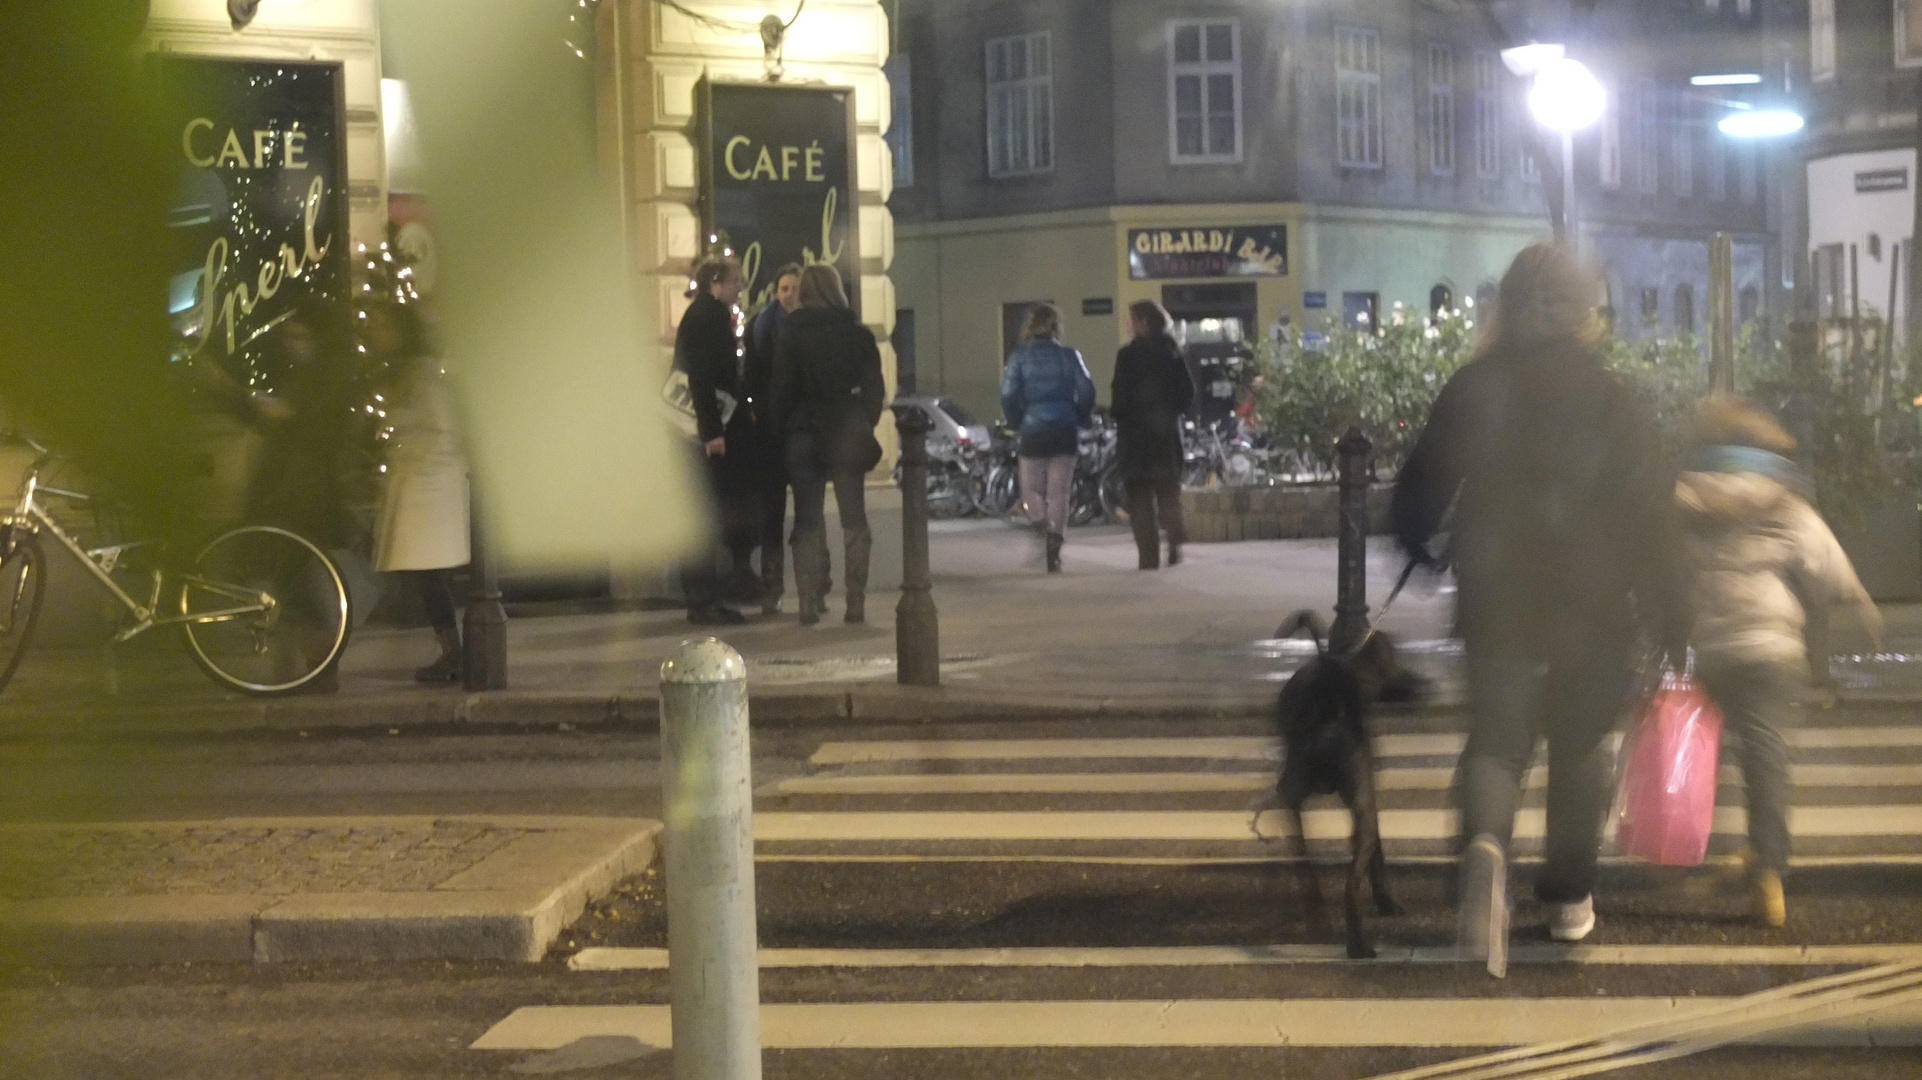 Eingang zum Café Sperl in Wien